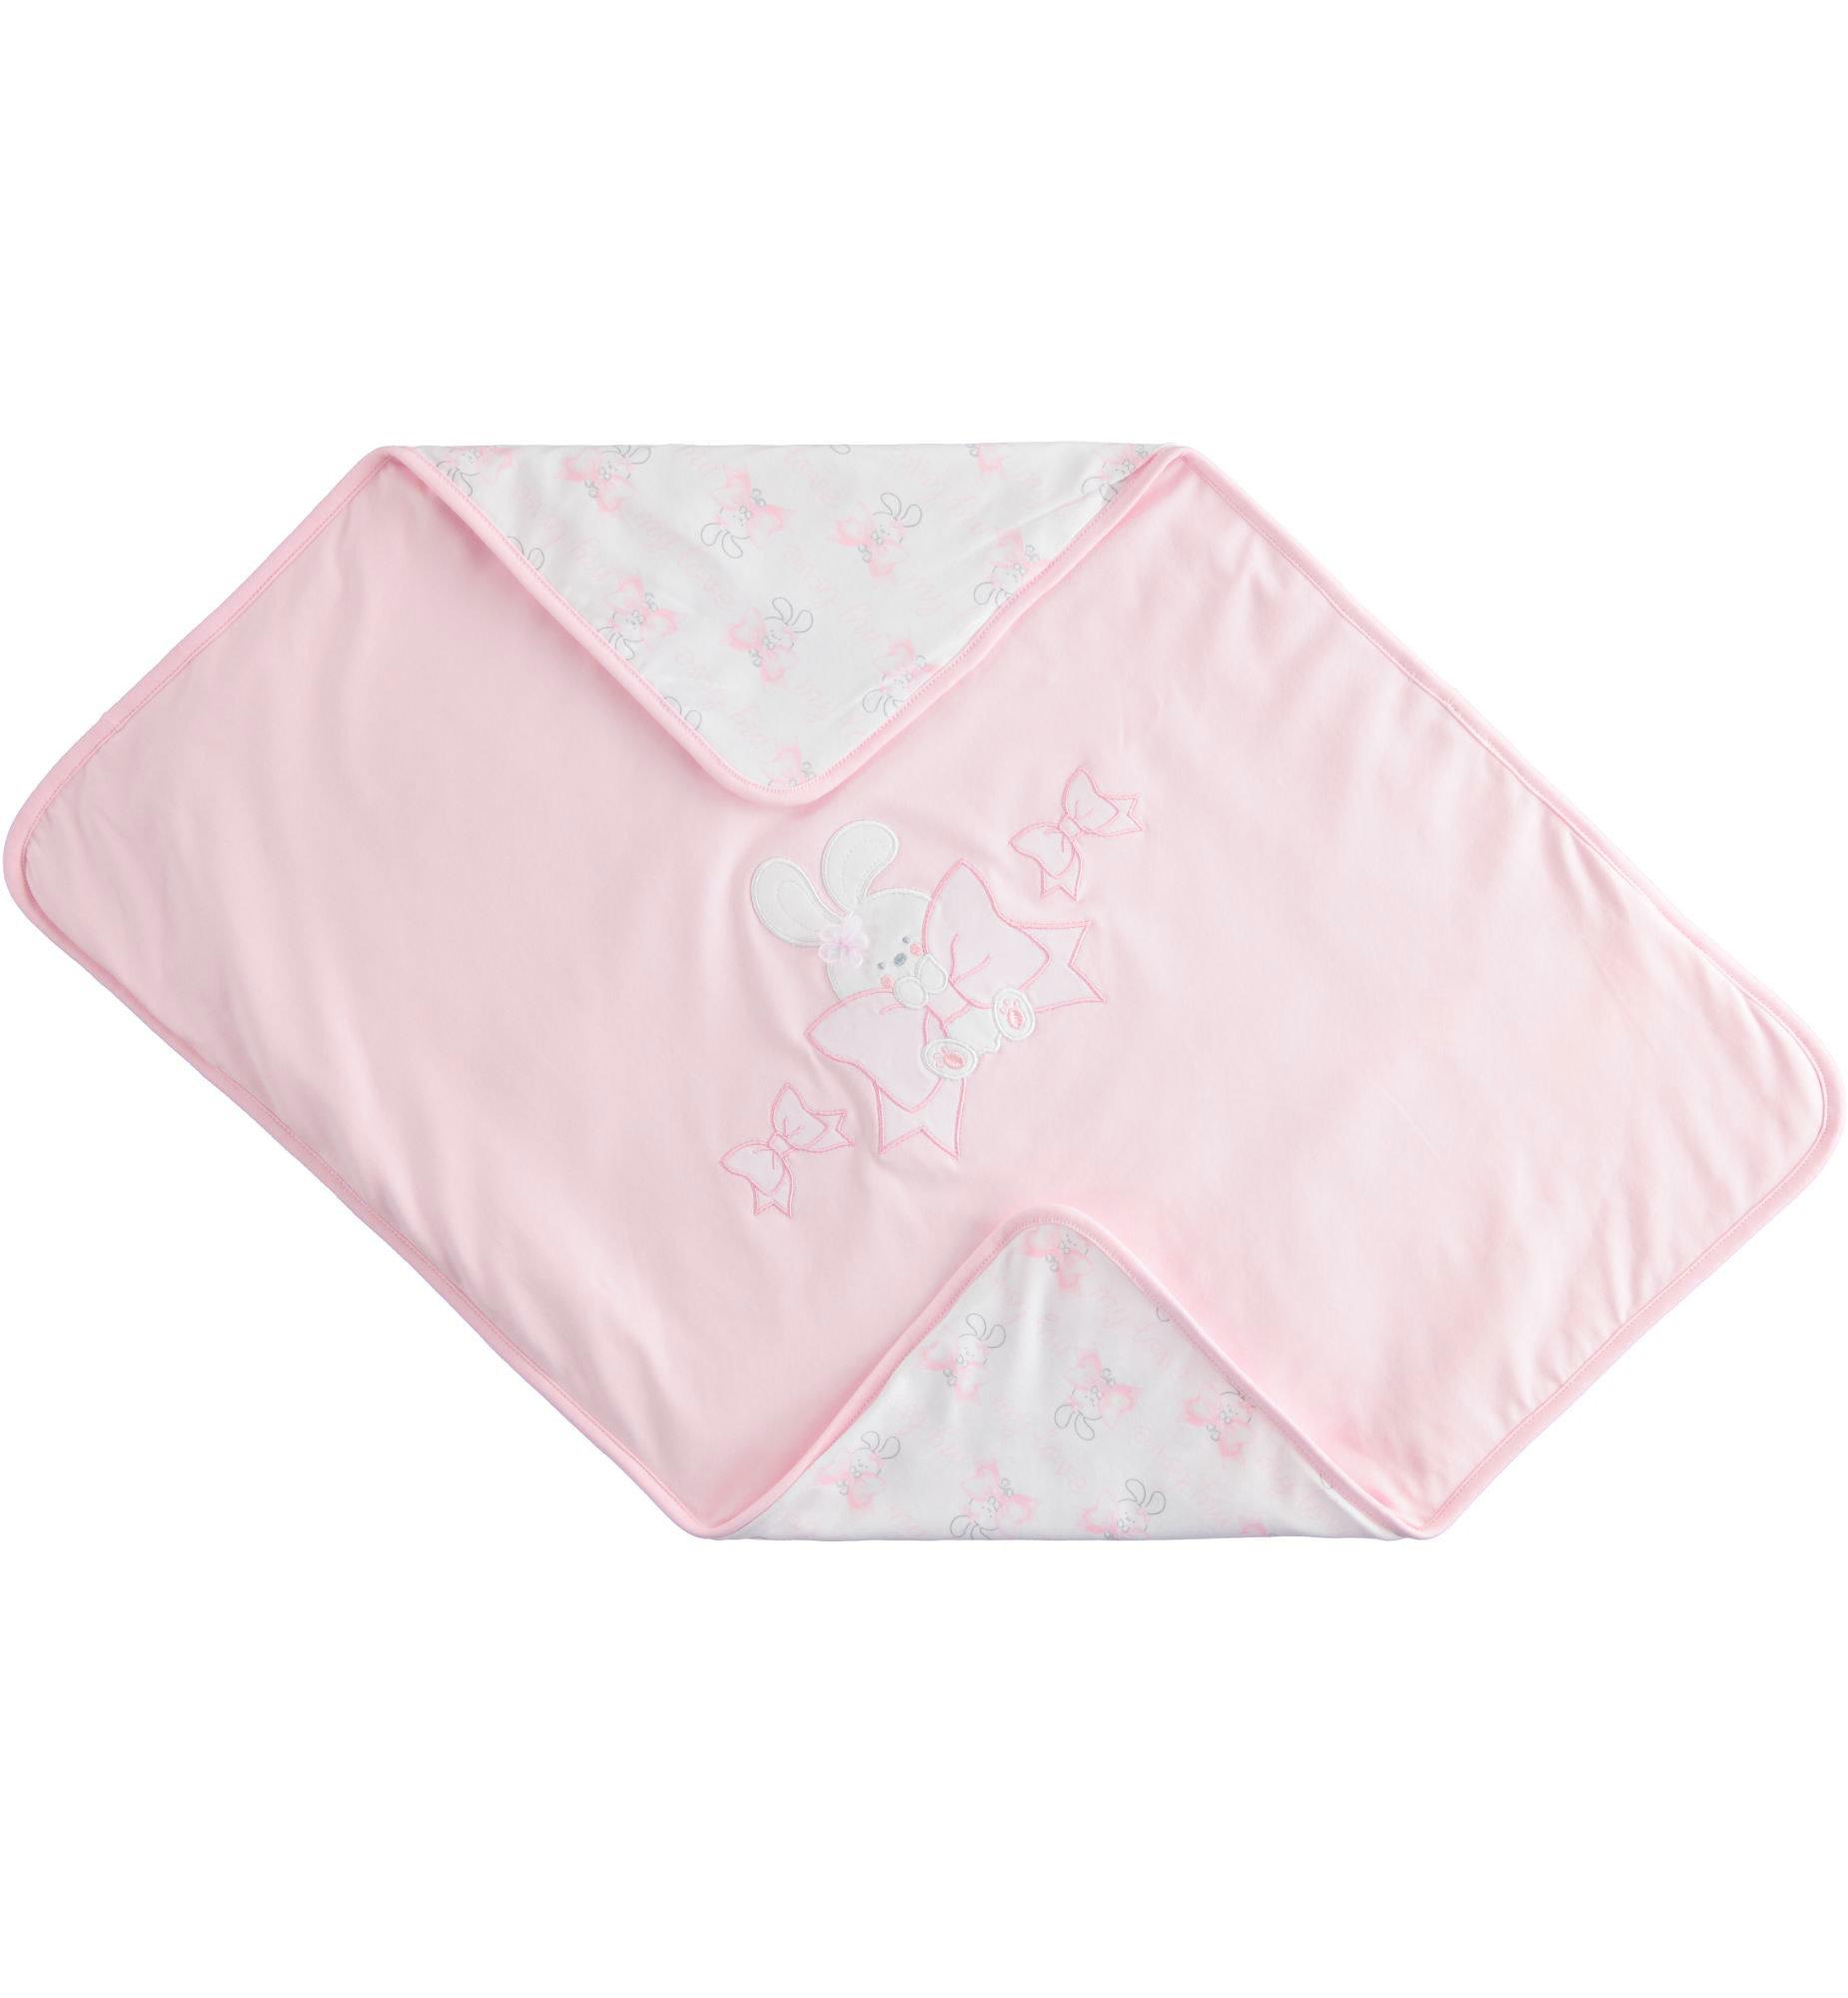 iDo iDO ss20 Baby girl pink bunny blanket J934